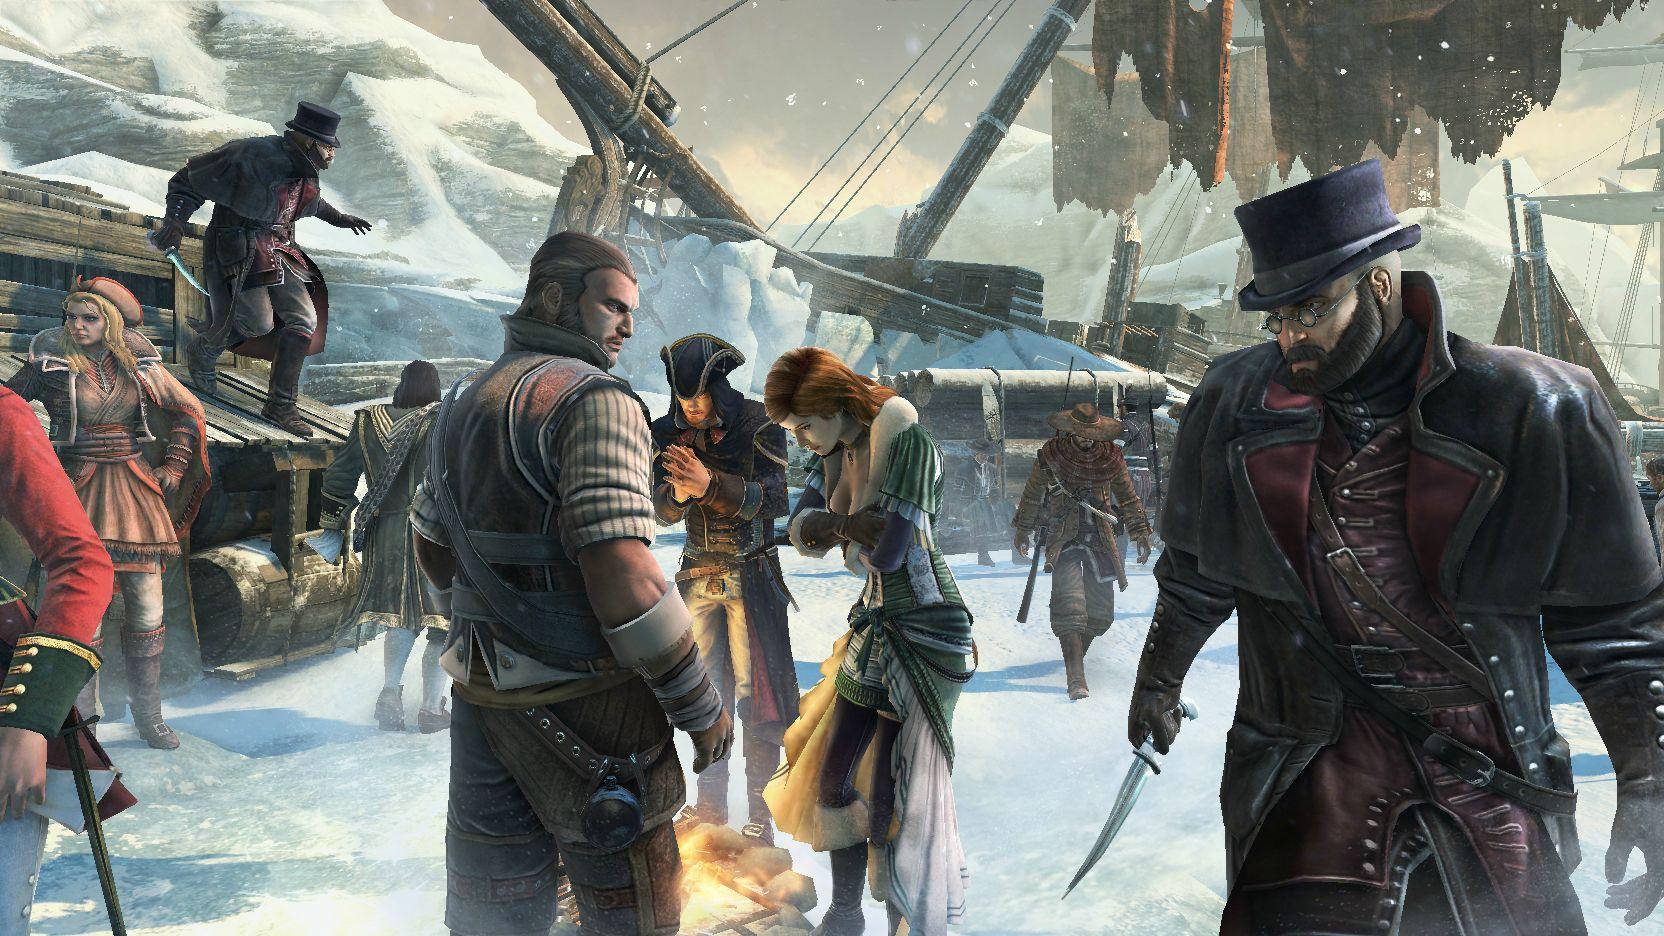 Komentovaná procházka Bostonem v Assassin's Creed 3 68055